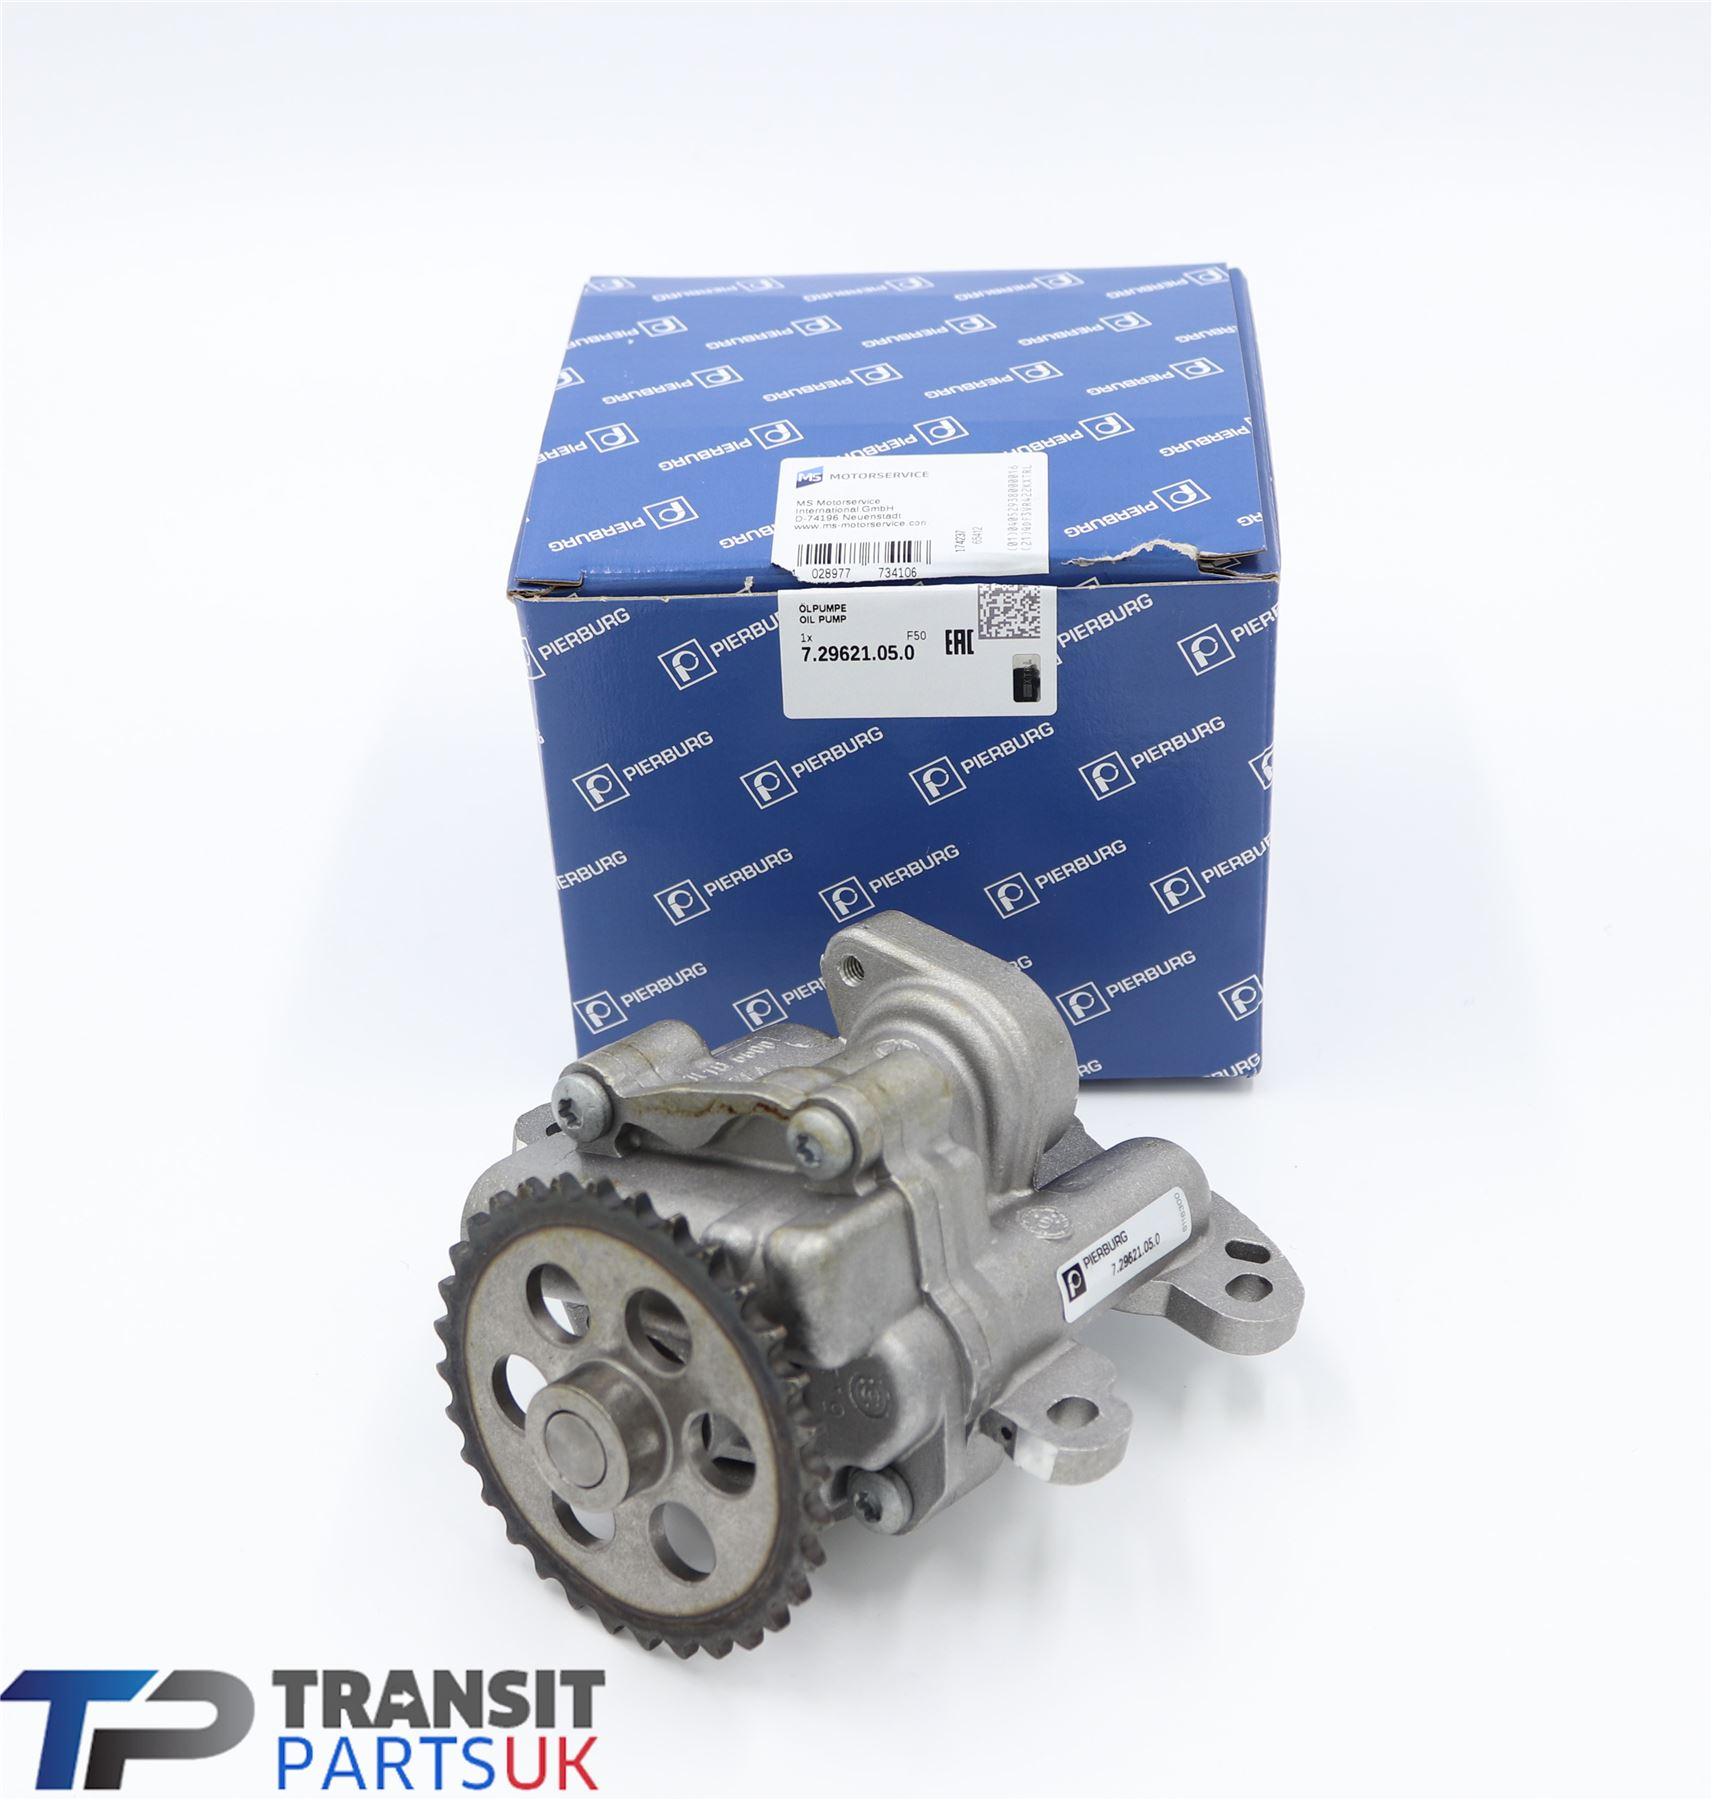 Transit Parts Genuine Pierburg Transit MK6 MK7 2.2 2.4 Oil Pump Relay Boxer Defender